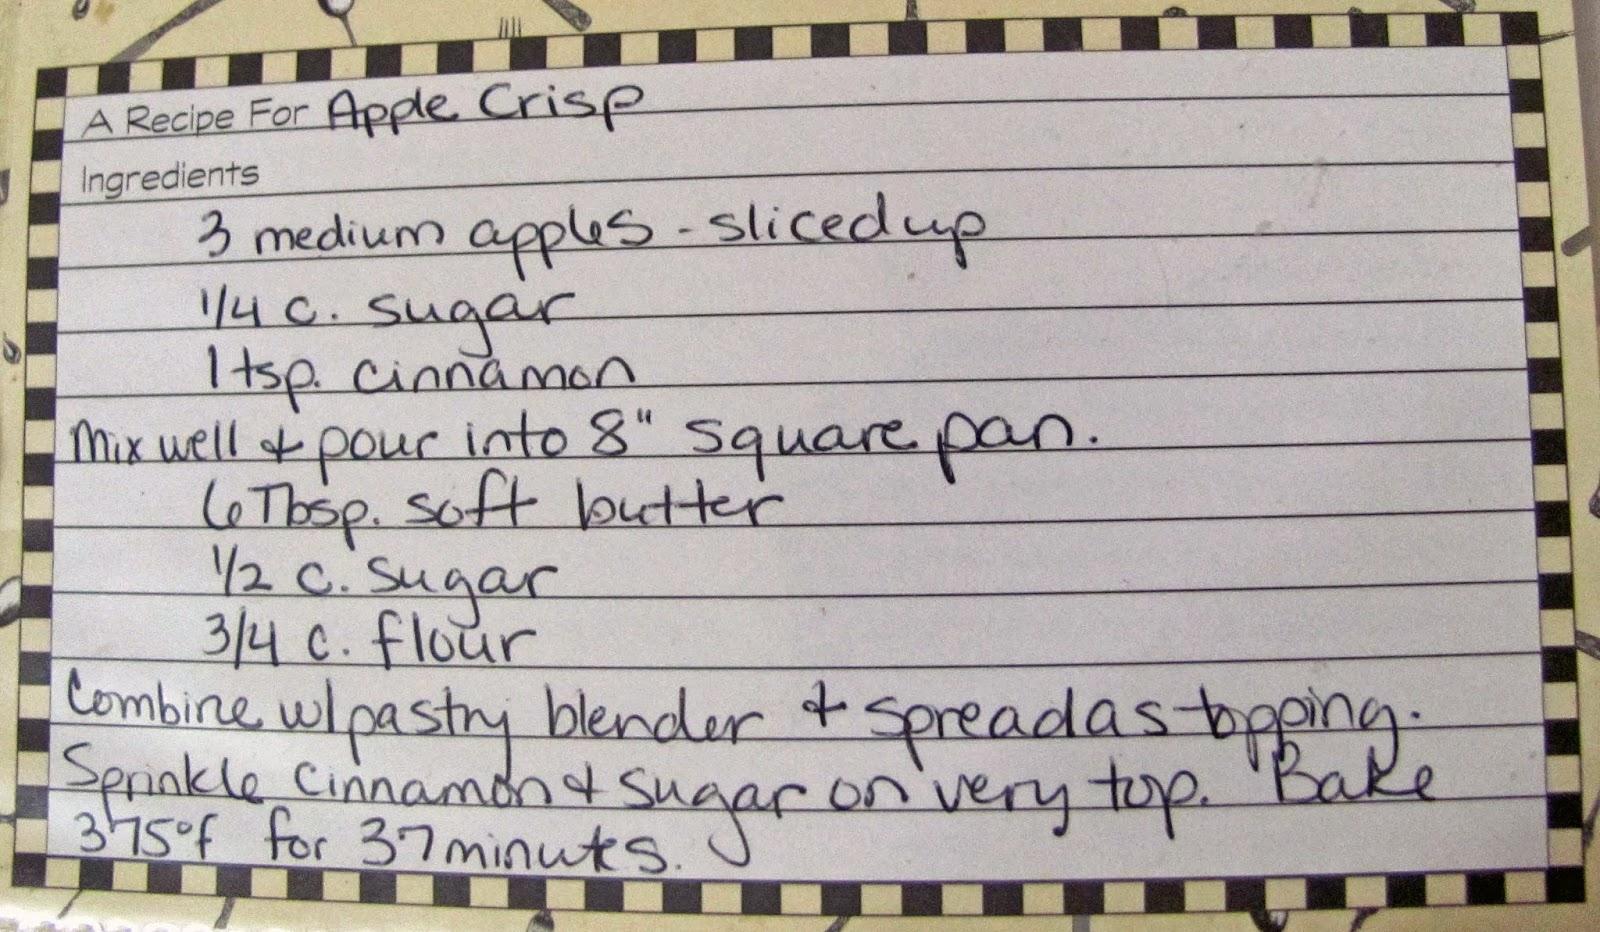 http://ichoosejoy2day.blogspot.com/2014/10/baking-fall-treats-healthier-apple.html